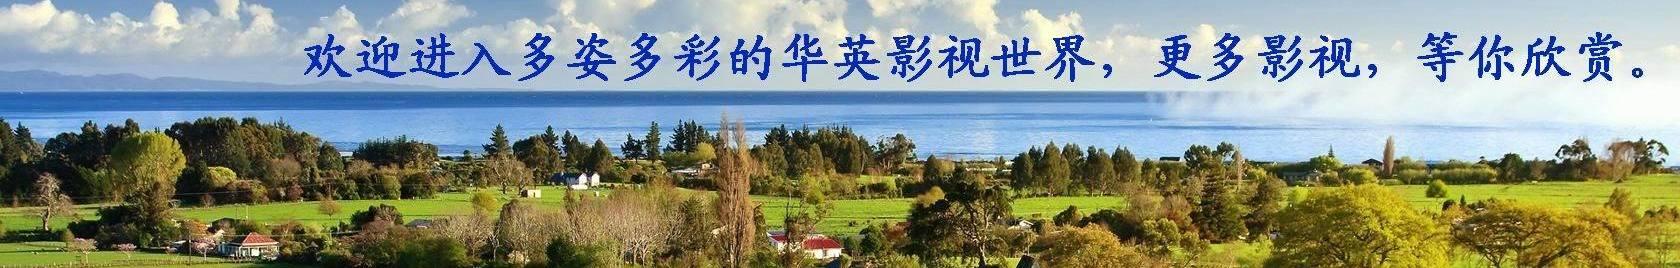 华英影视工作站 banner